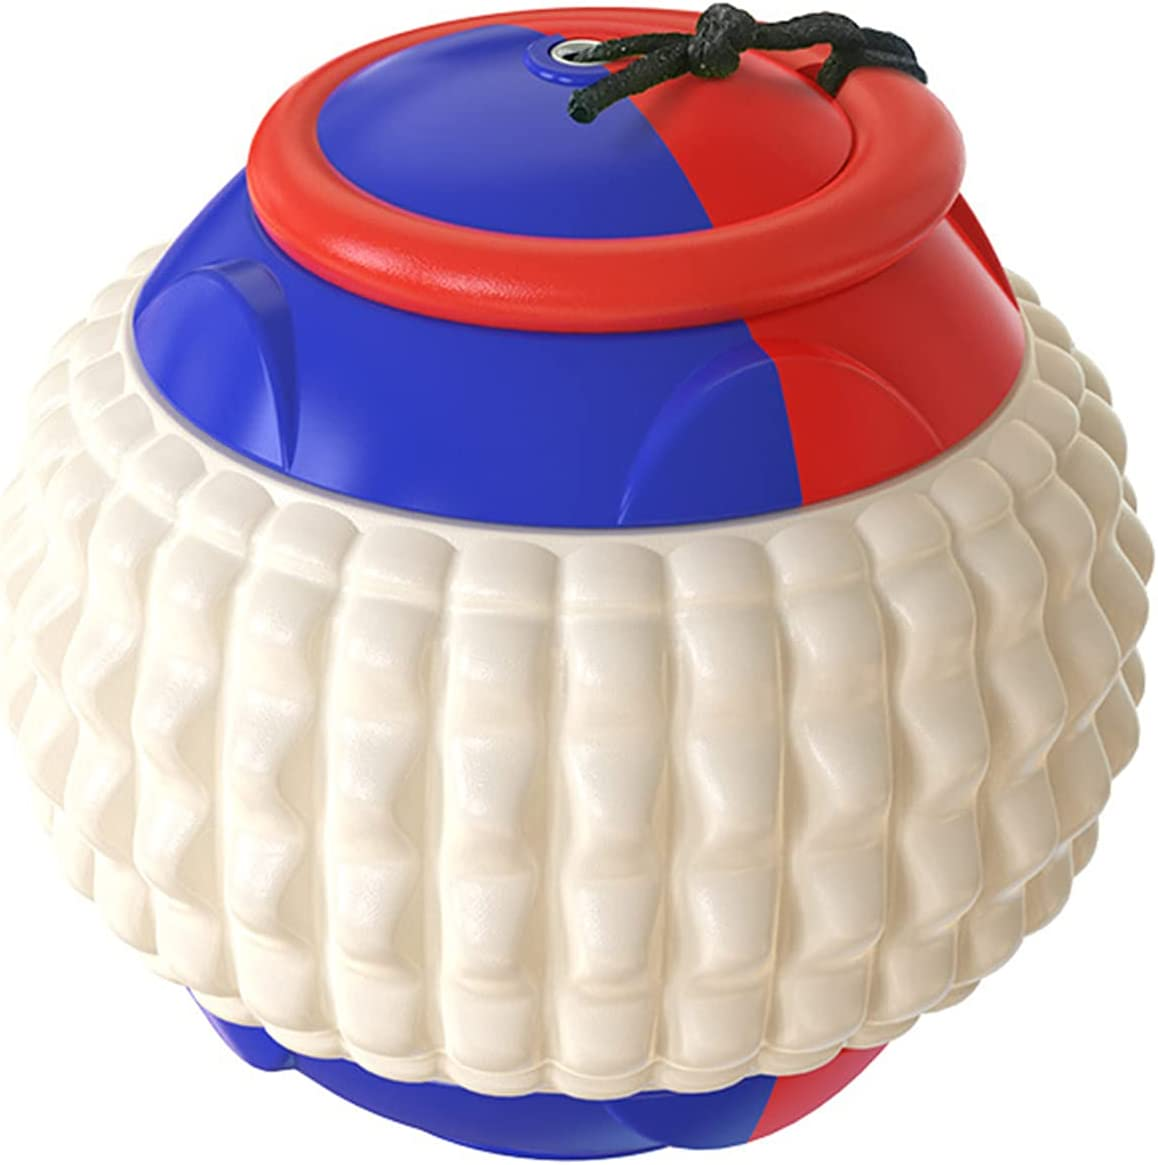 Wrth Multifunctional Dog Ball Thrower Portable Set Puppy Popular popular Import Durable